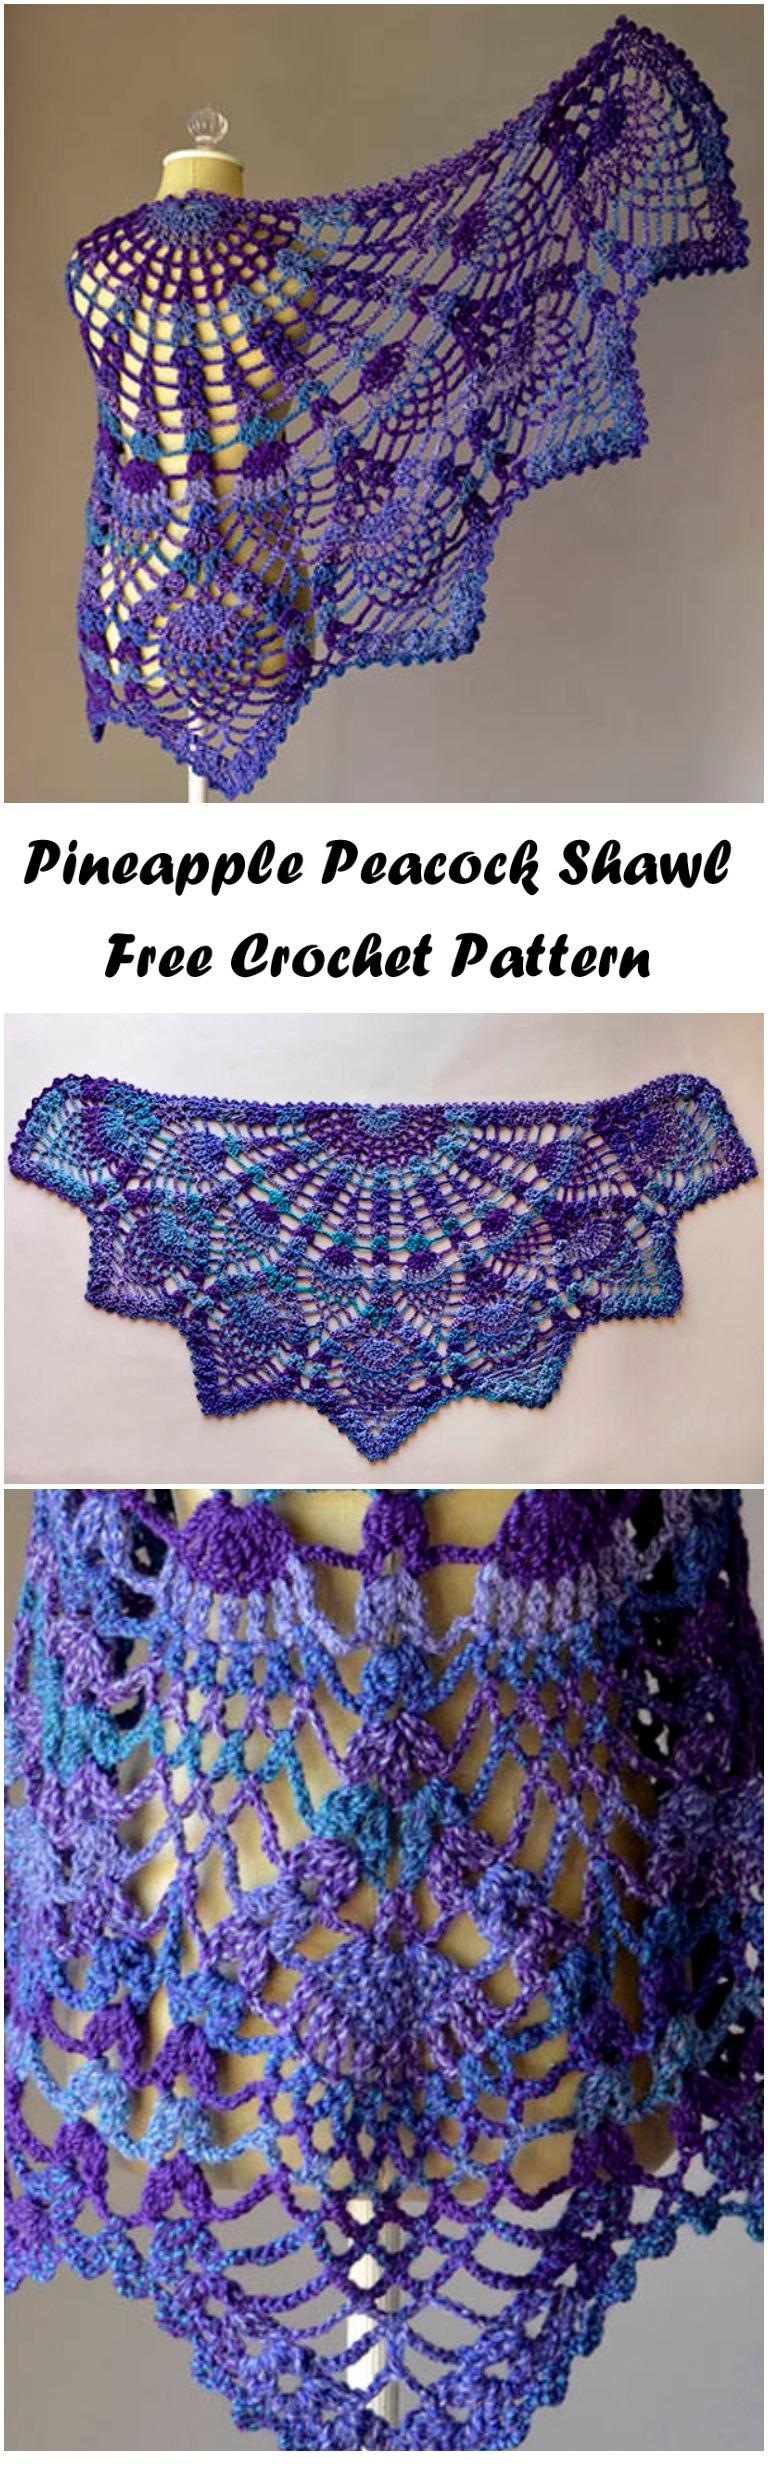 Crochet Pineapple Peacock Shawl Ilove Crochet